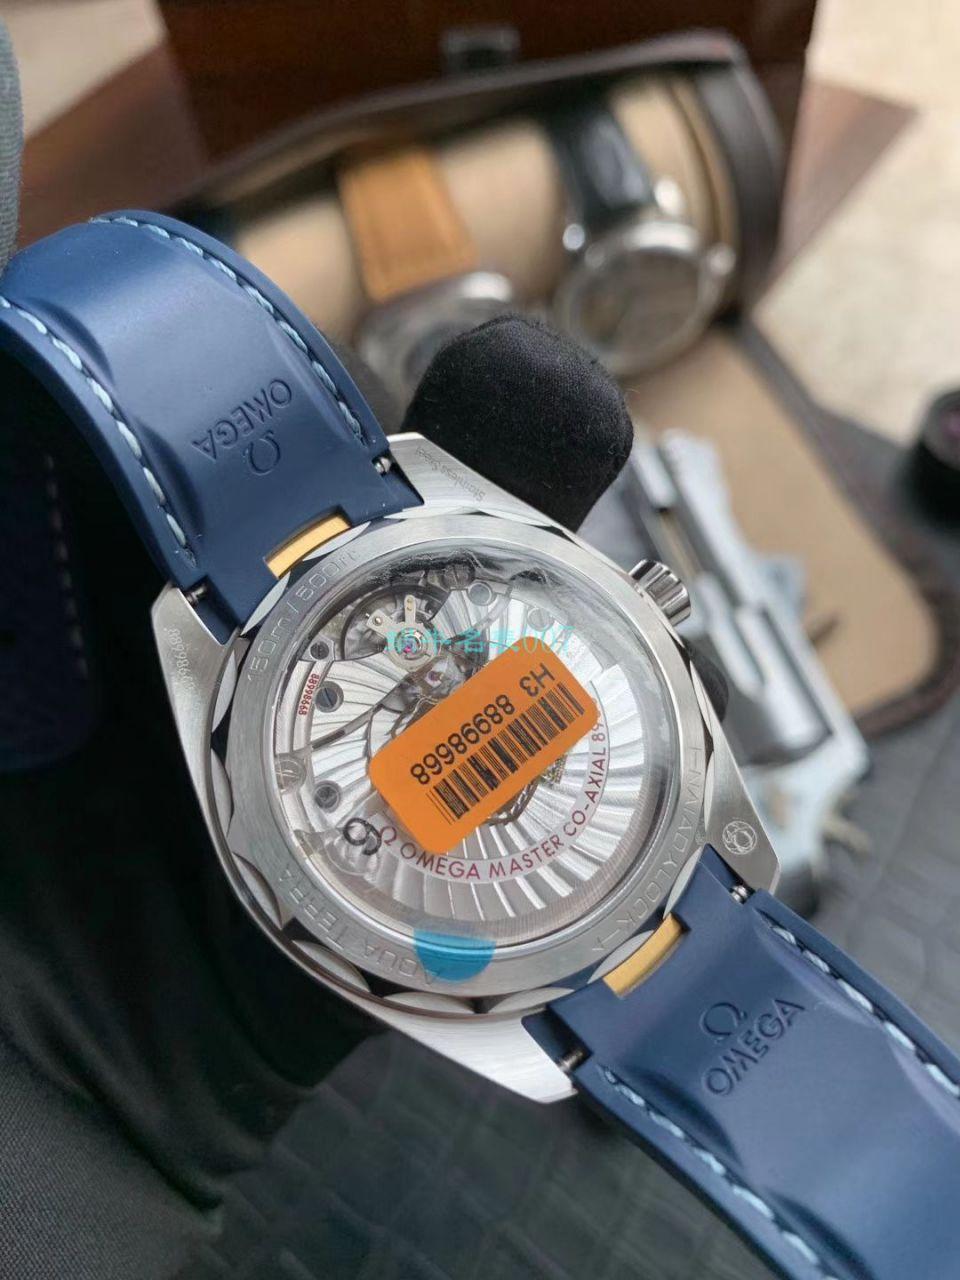 VS厂新金针队长欧米茄海马系列220.12.41.21.02.004莱德杯腕表